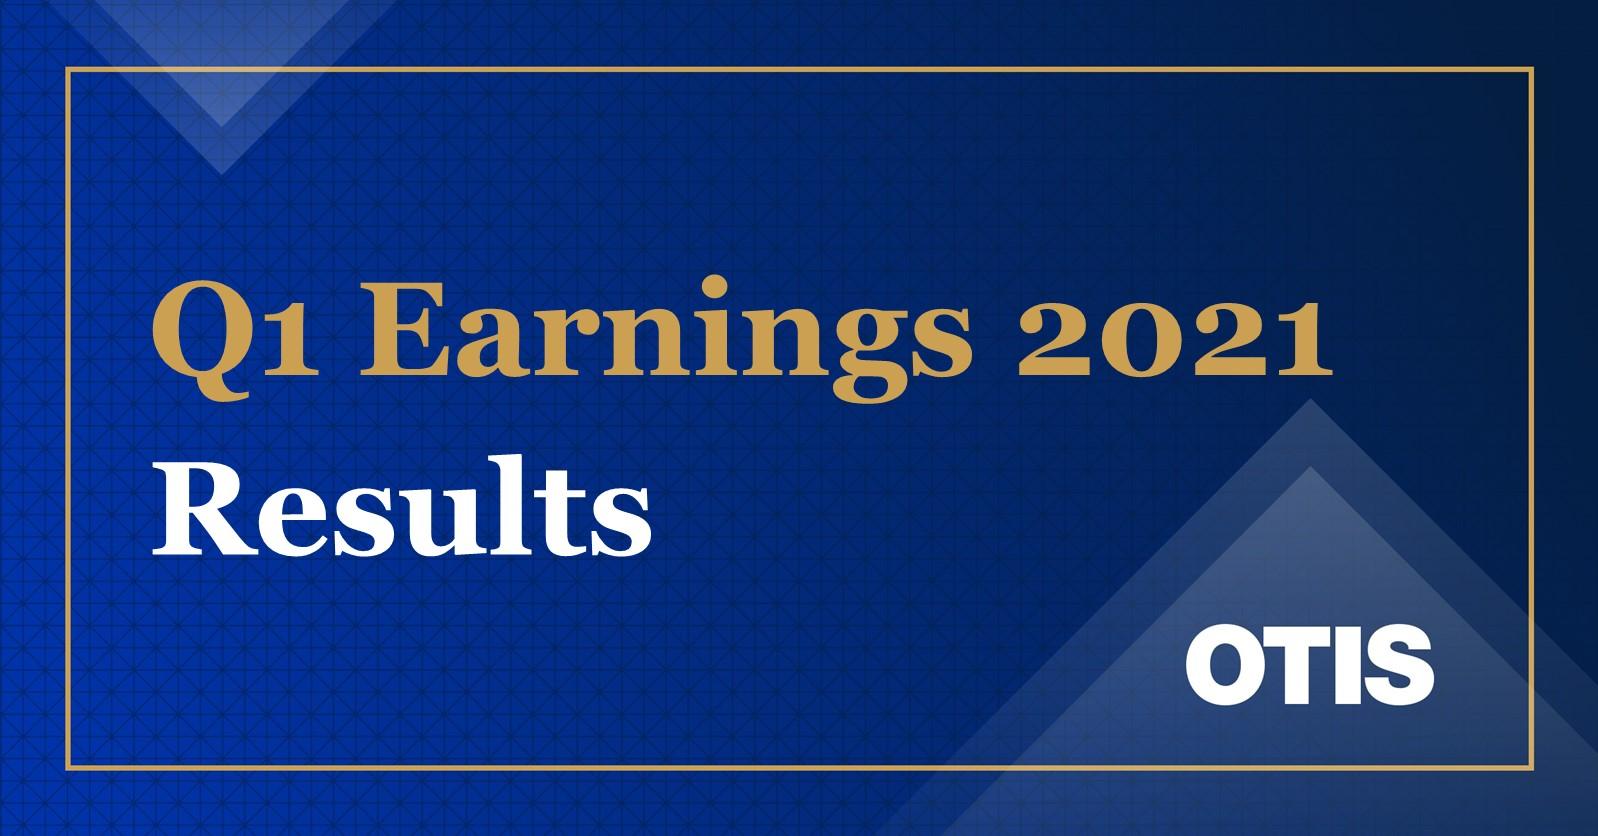 Otis reports Q1 2021 Results